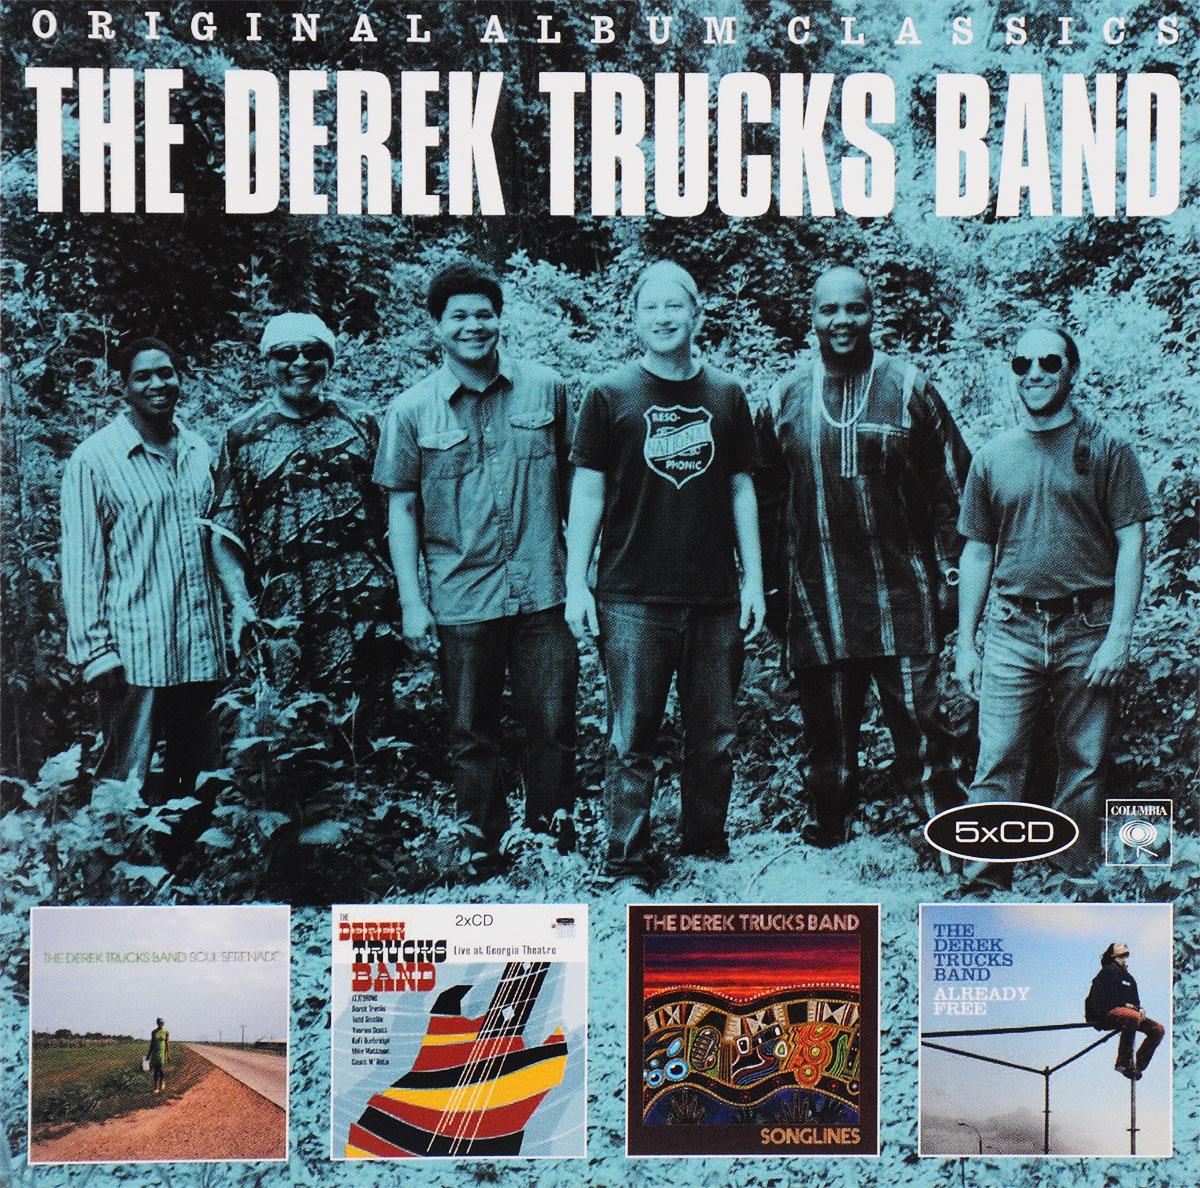 цена на The Derek Trucks Band The Derek Trucks Band. Original Album Classics (5 CD)